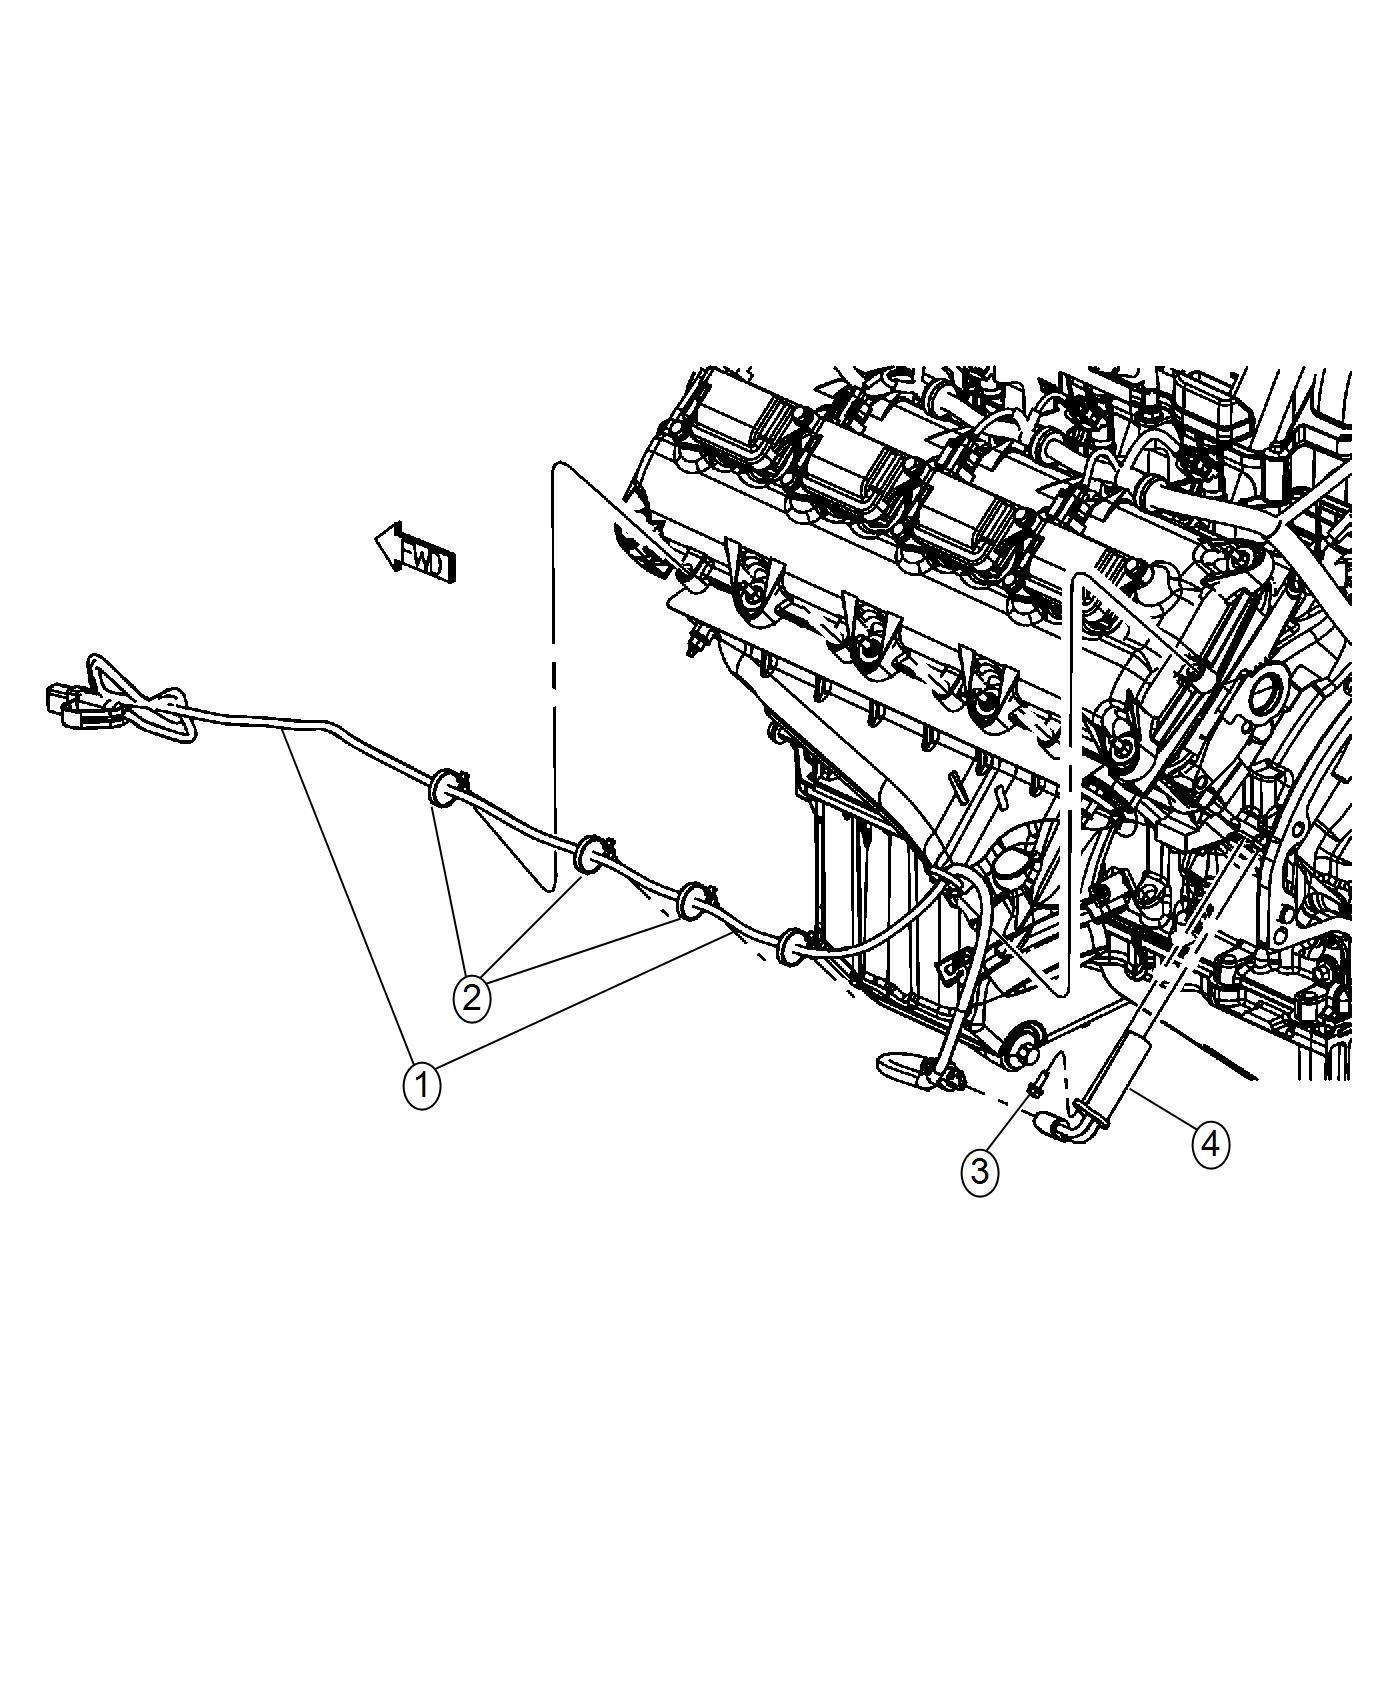 2017 Ram 3500 Cord. Engine block heater. [engine block